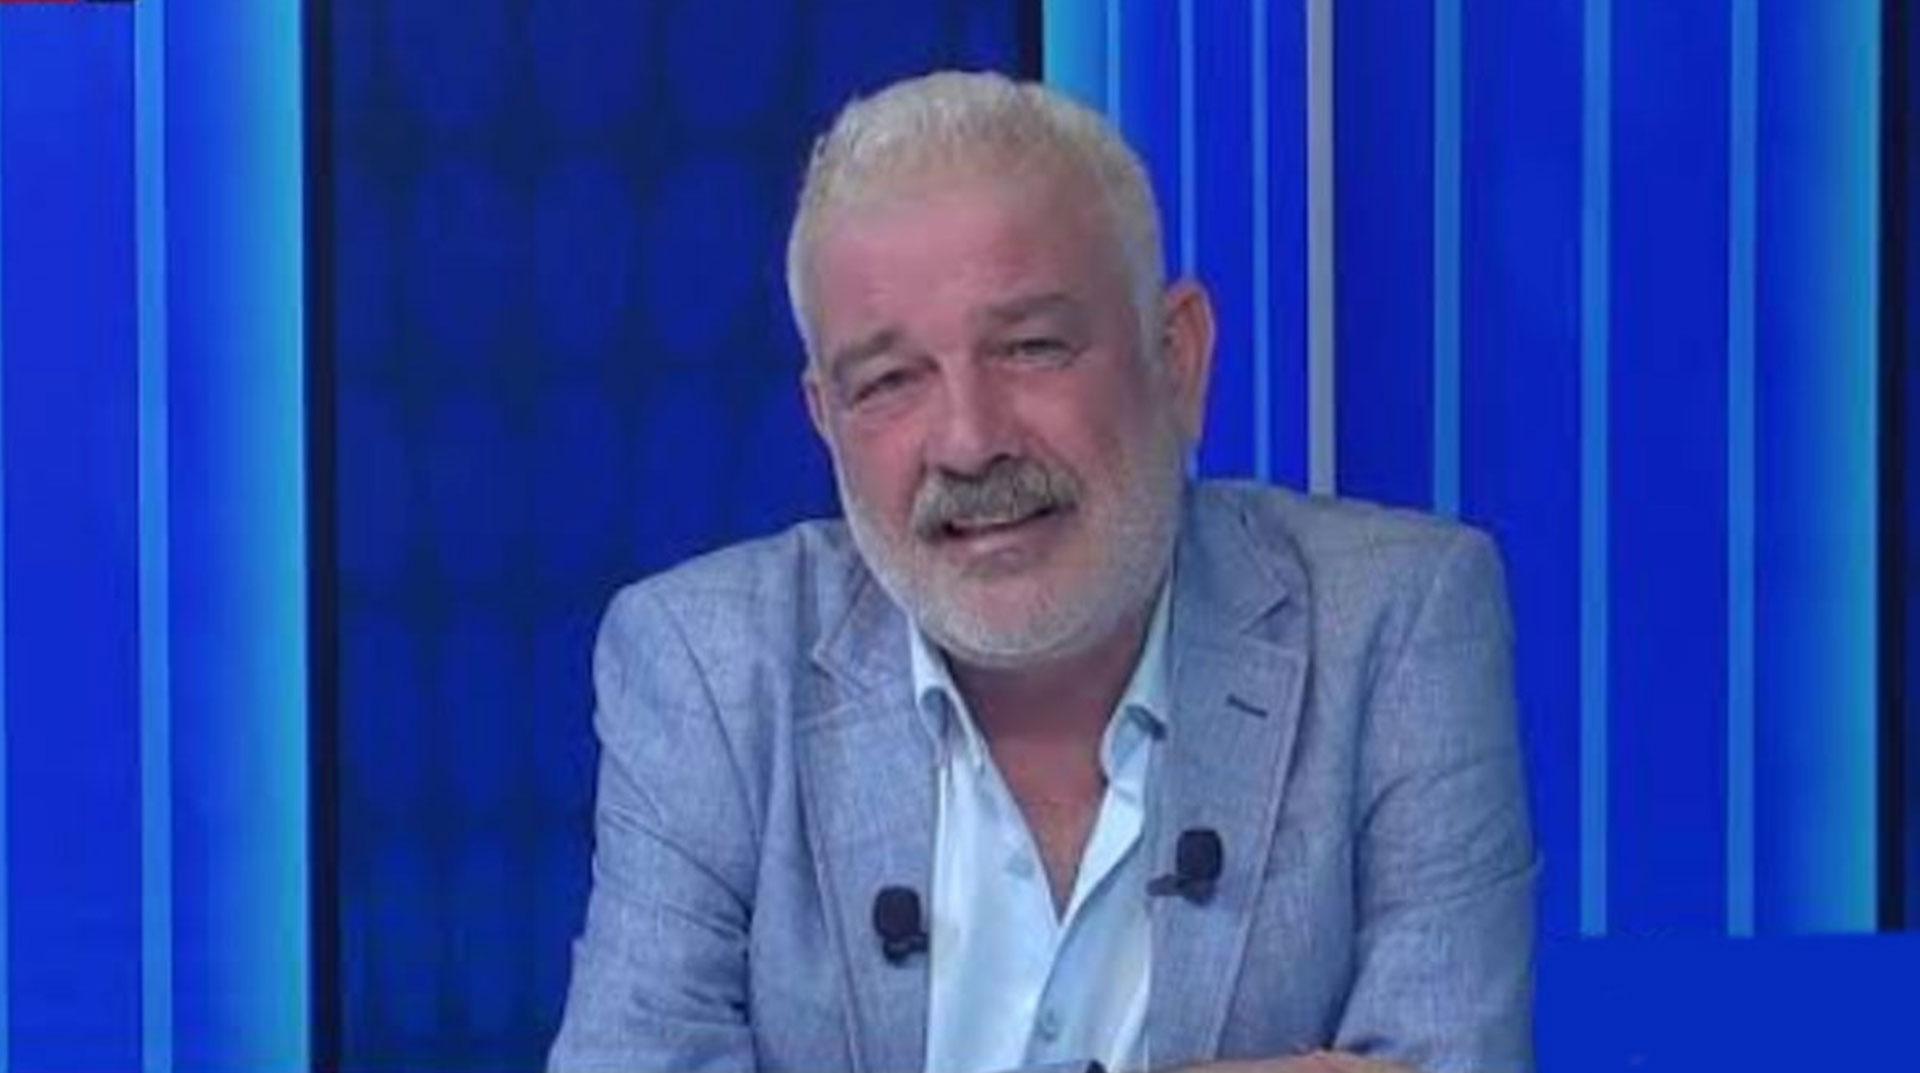 Ali Tezel gözaltına alındı